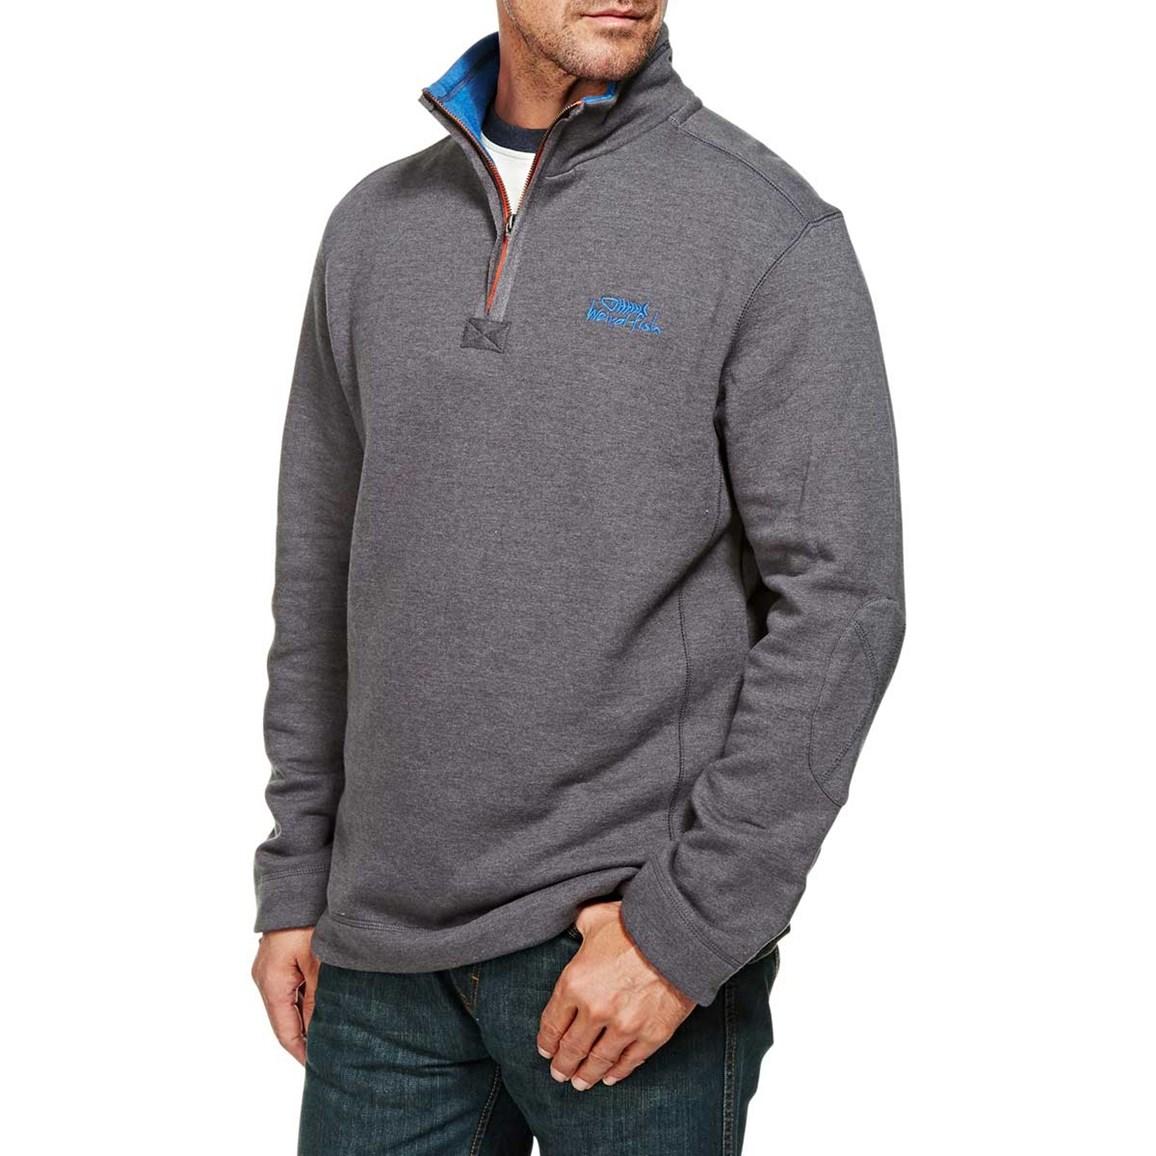 Hail Plain 1/4 Neck Zip Embroidered Sweatshirt Ebony